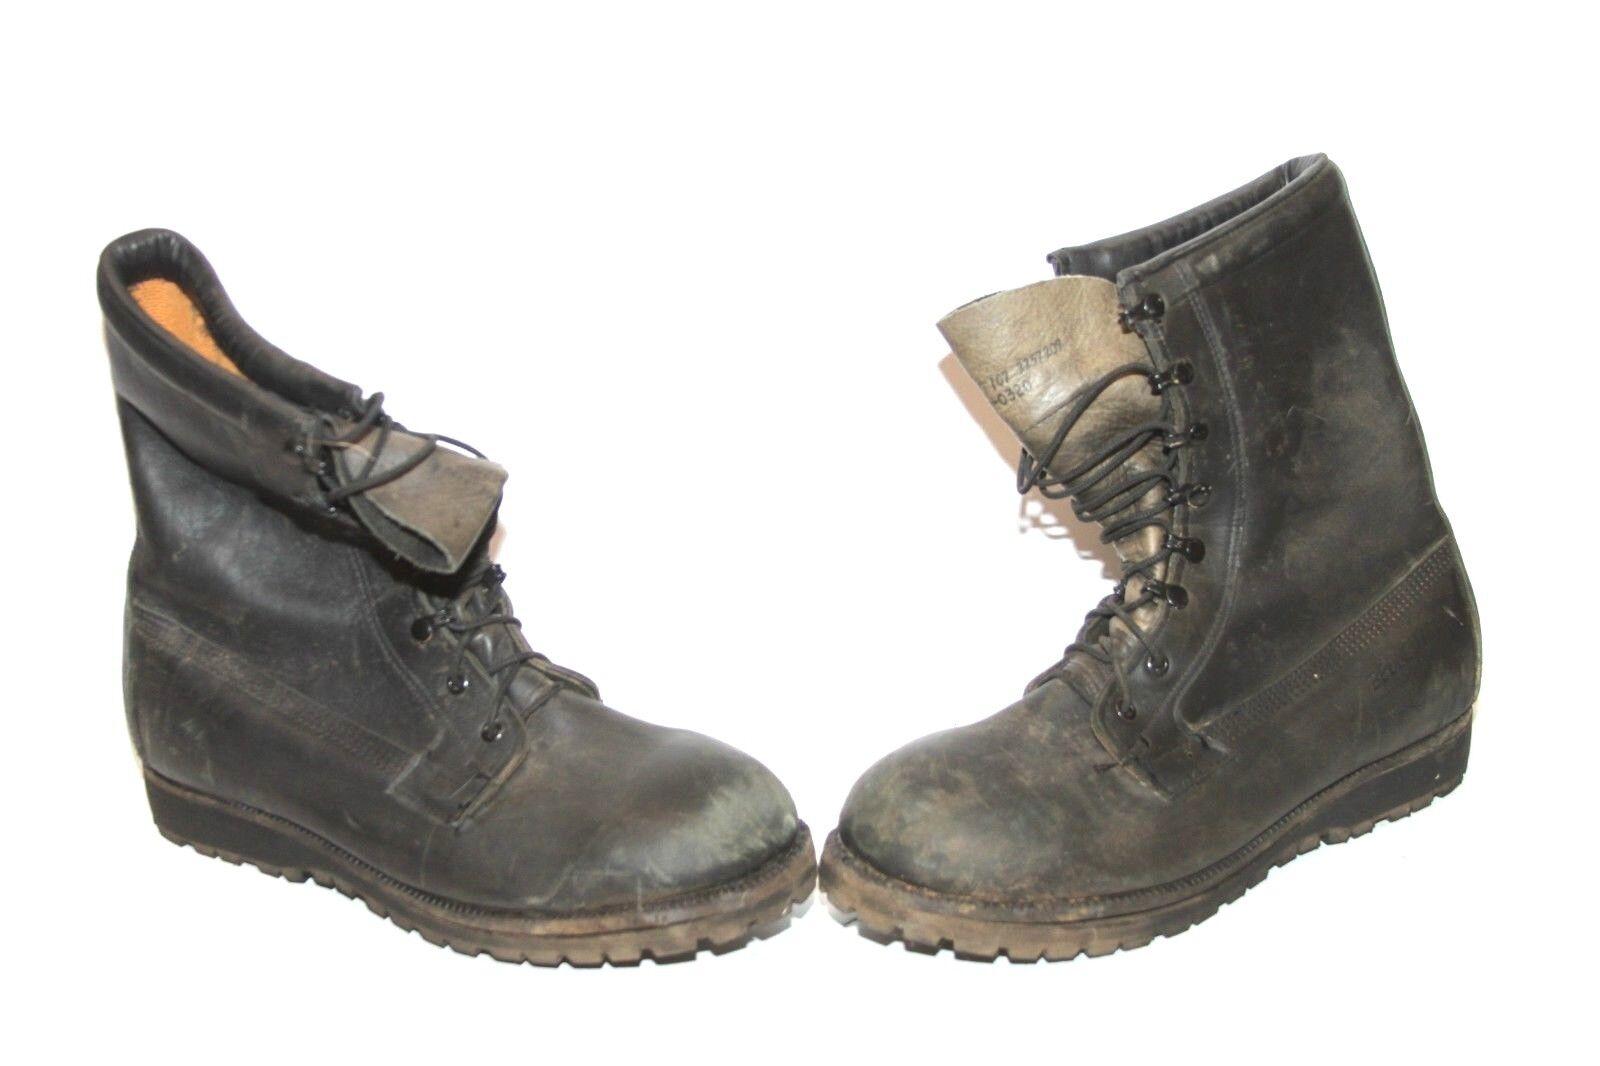 Mens Belleville 287 107 Gore-Tex Black Leather Combat Boots SZ 10.5w Steel Toe